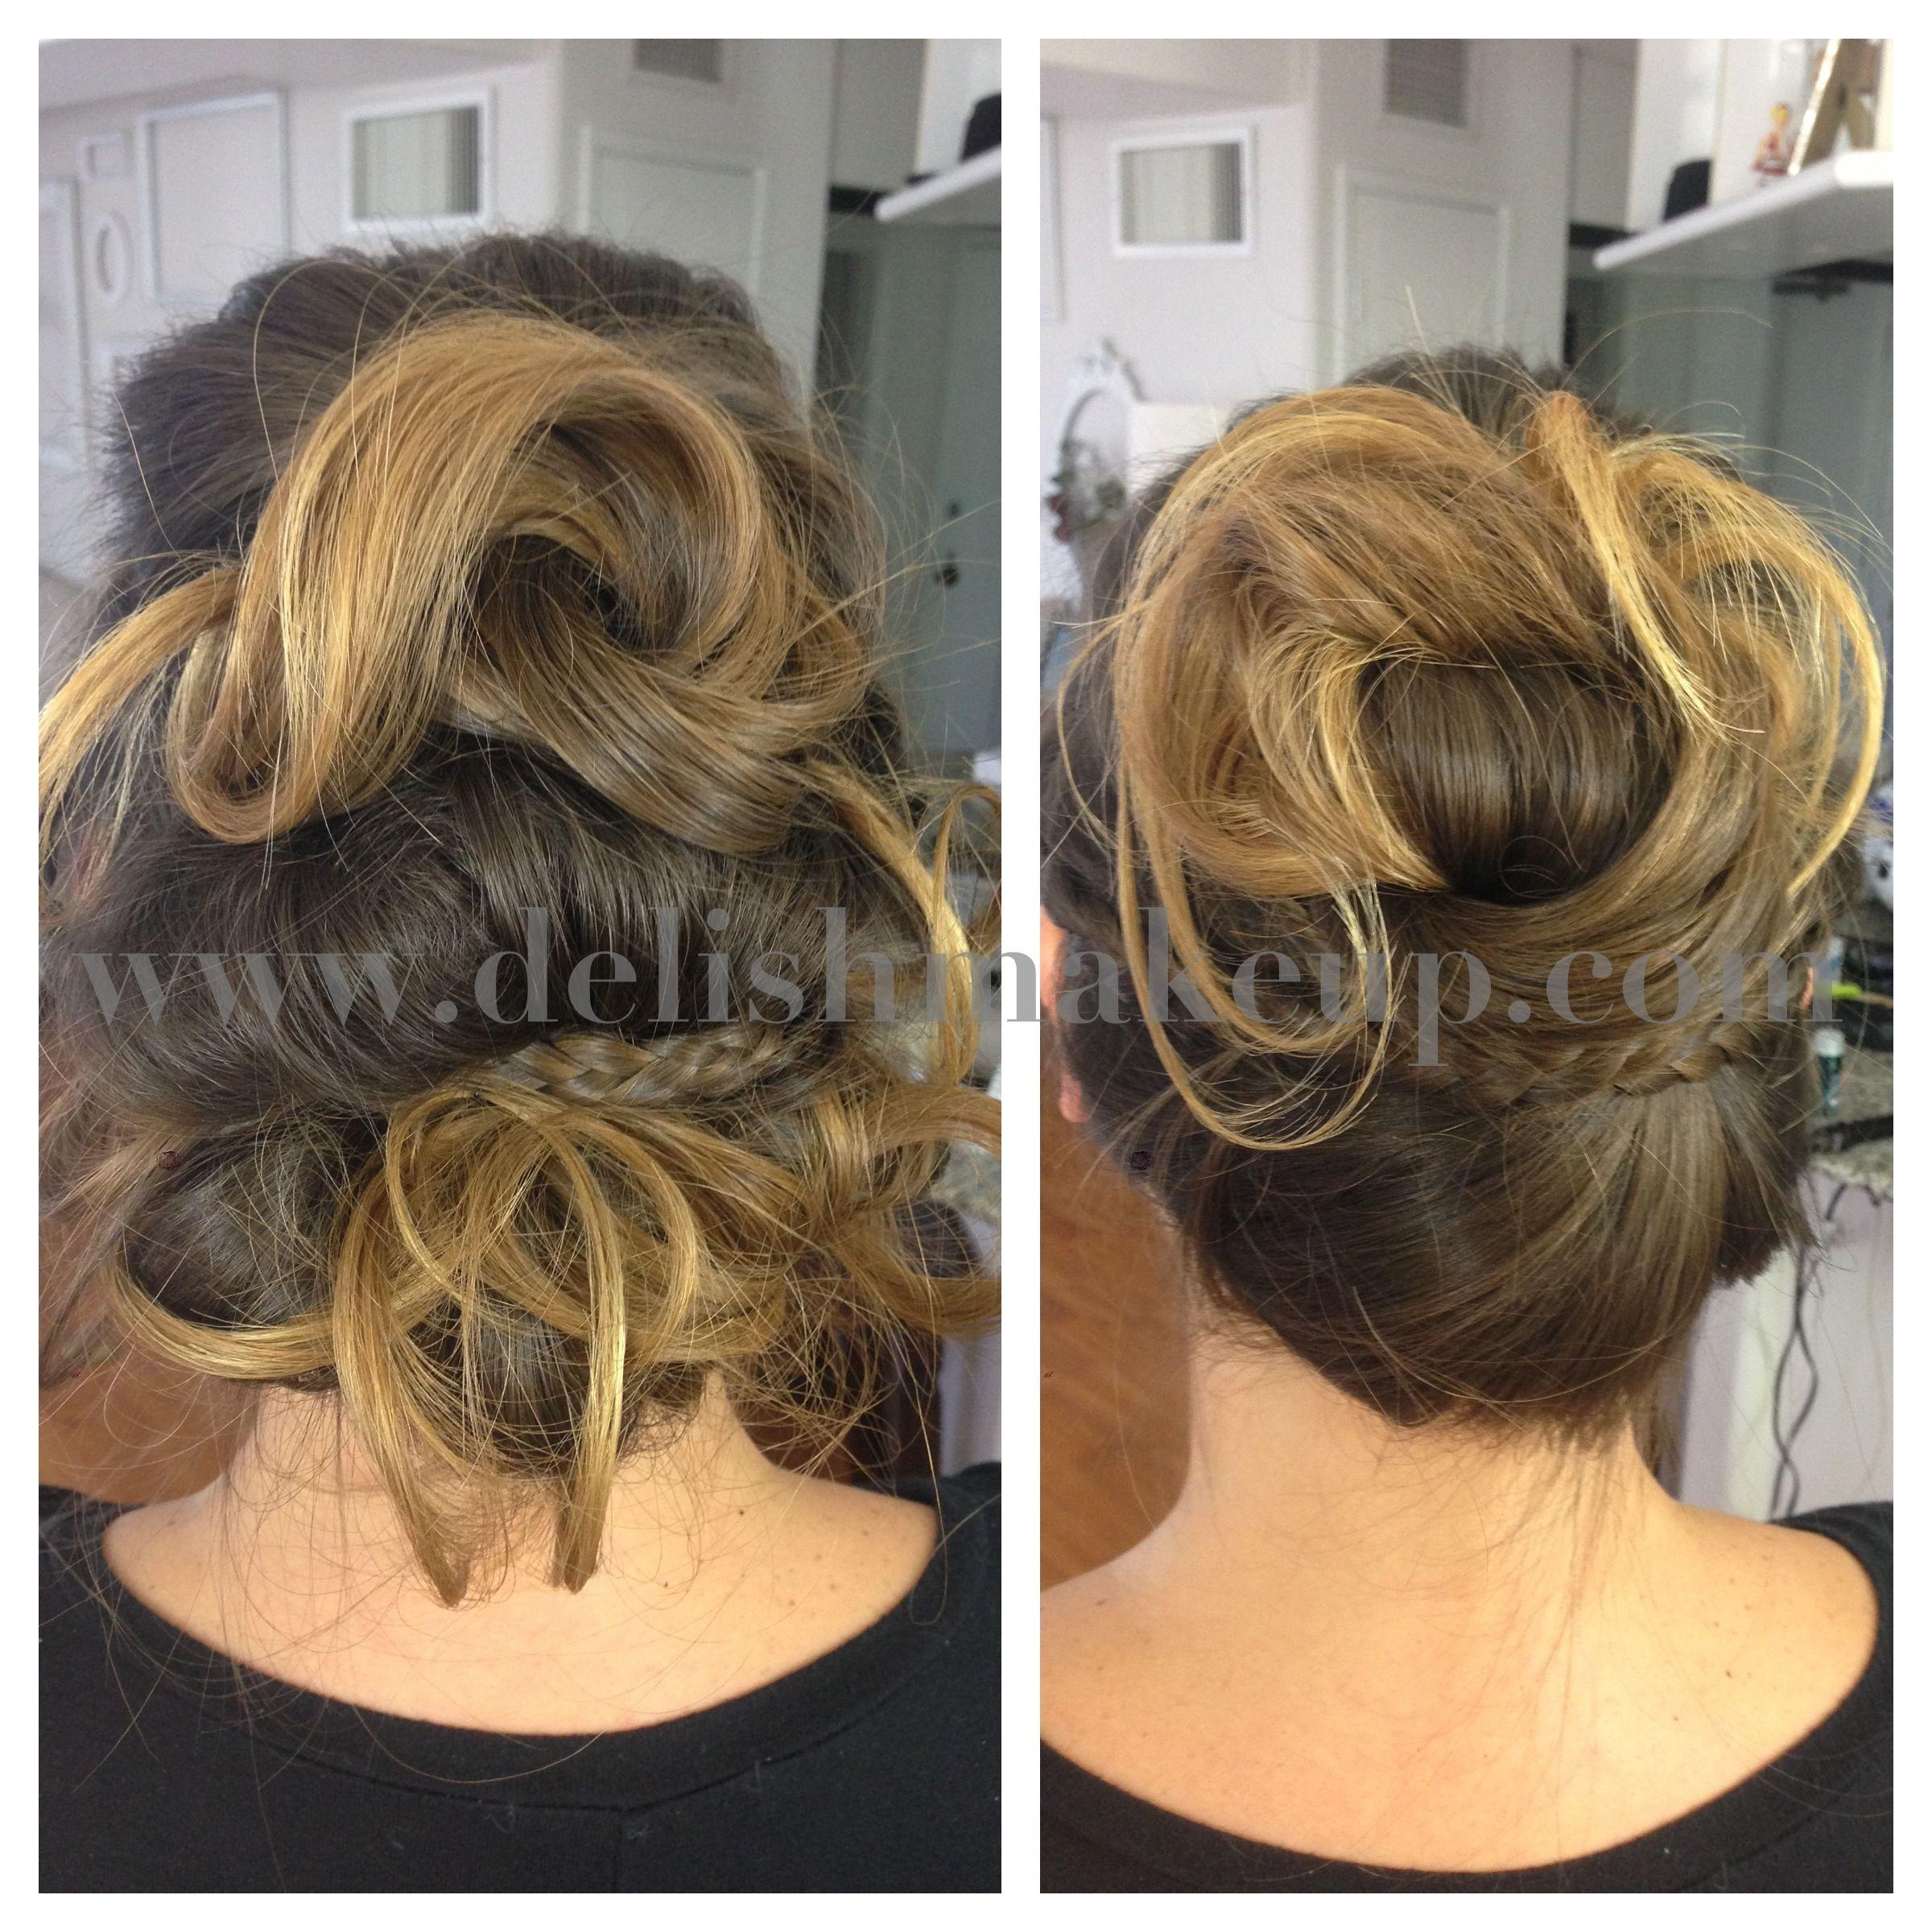 Messy updos Hawaii makeup and hair artist Artistic hair